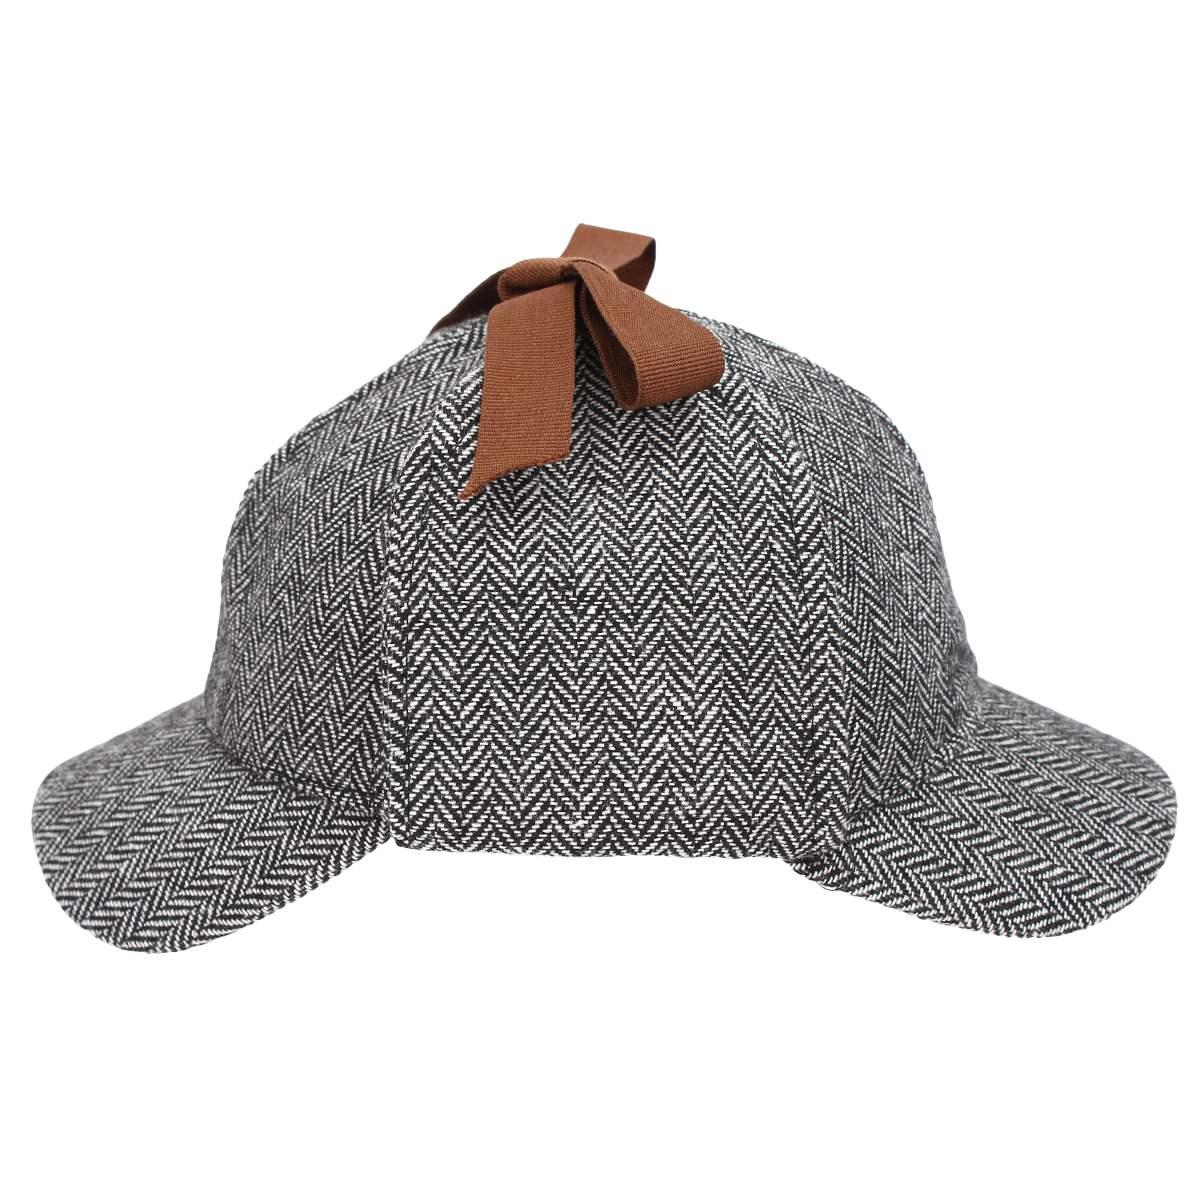 Women Men Earflap Berets Cap Tweed Gatsby Detective Hats Role Play Sherlock  Holmes Deerstalker Hat Winter Warm Visor Casquette-in Berets from Apparel  ... a3cceb49473c